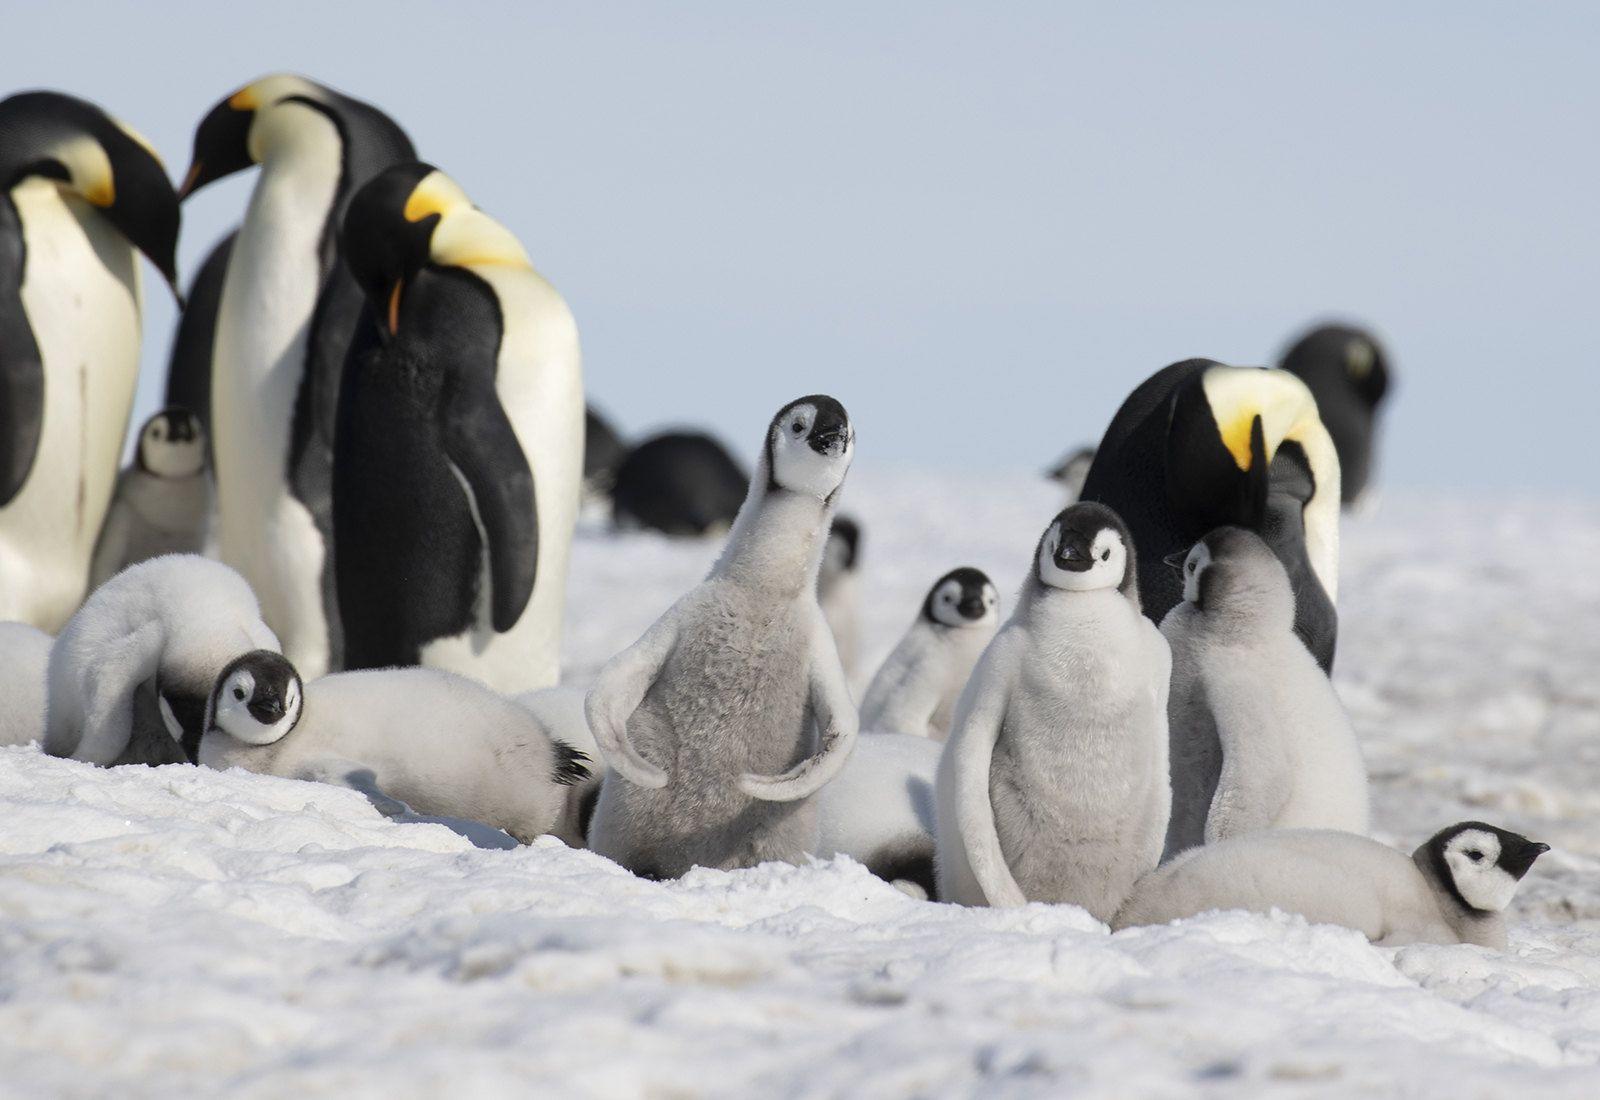 Snow Hill Island Penguins, Emperor penguin, Antarctica